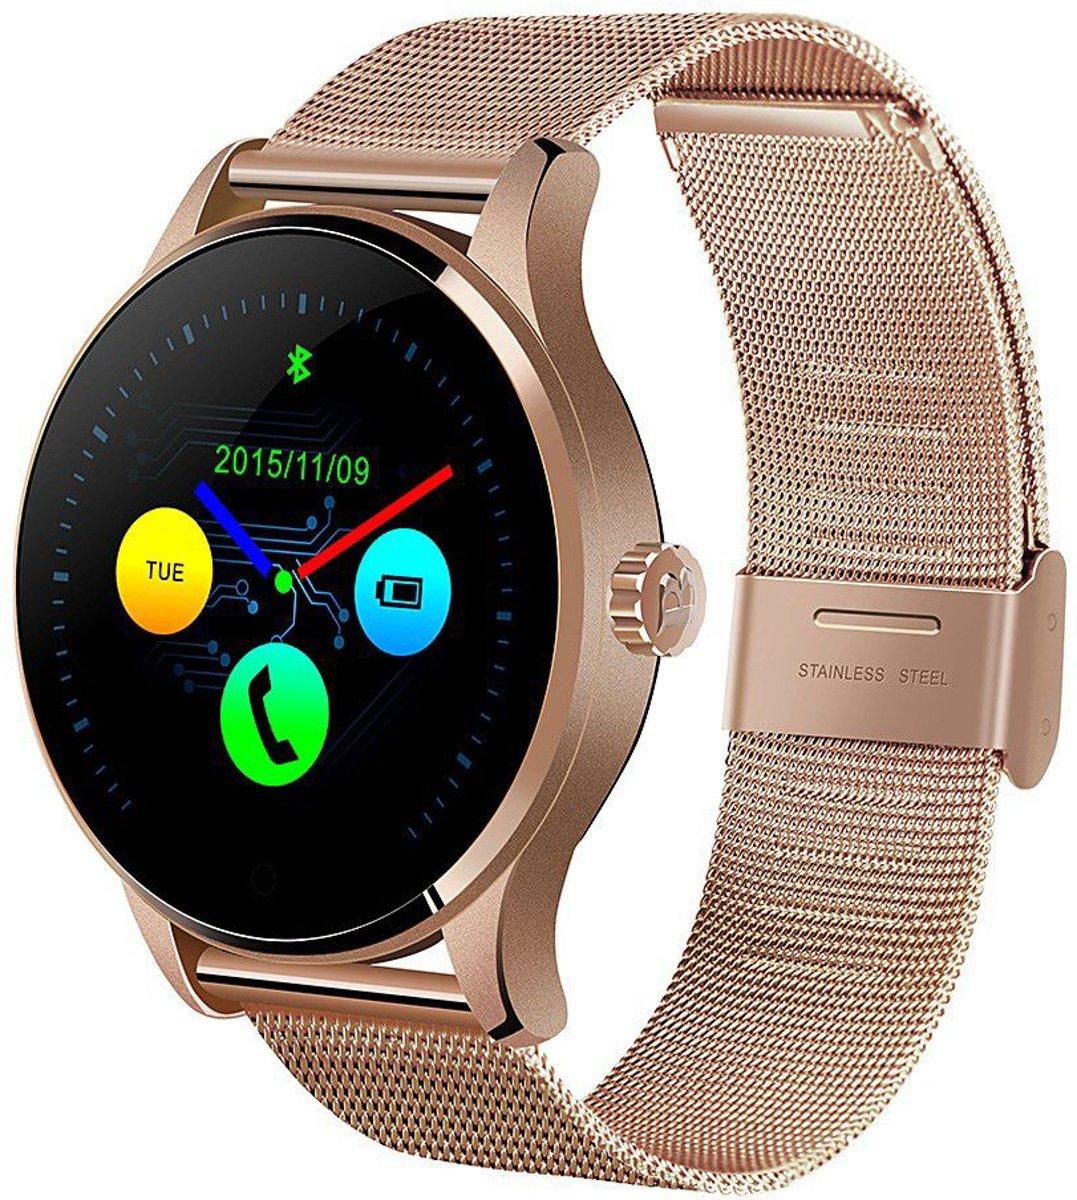 Afbeelding van Gouden Trade up to Date Smartwatch K88H - Goud - Metaal + Losse Screenprotector